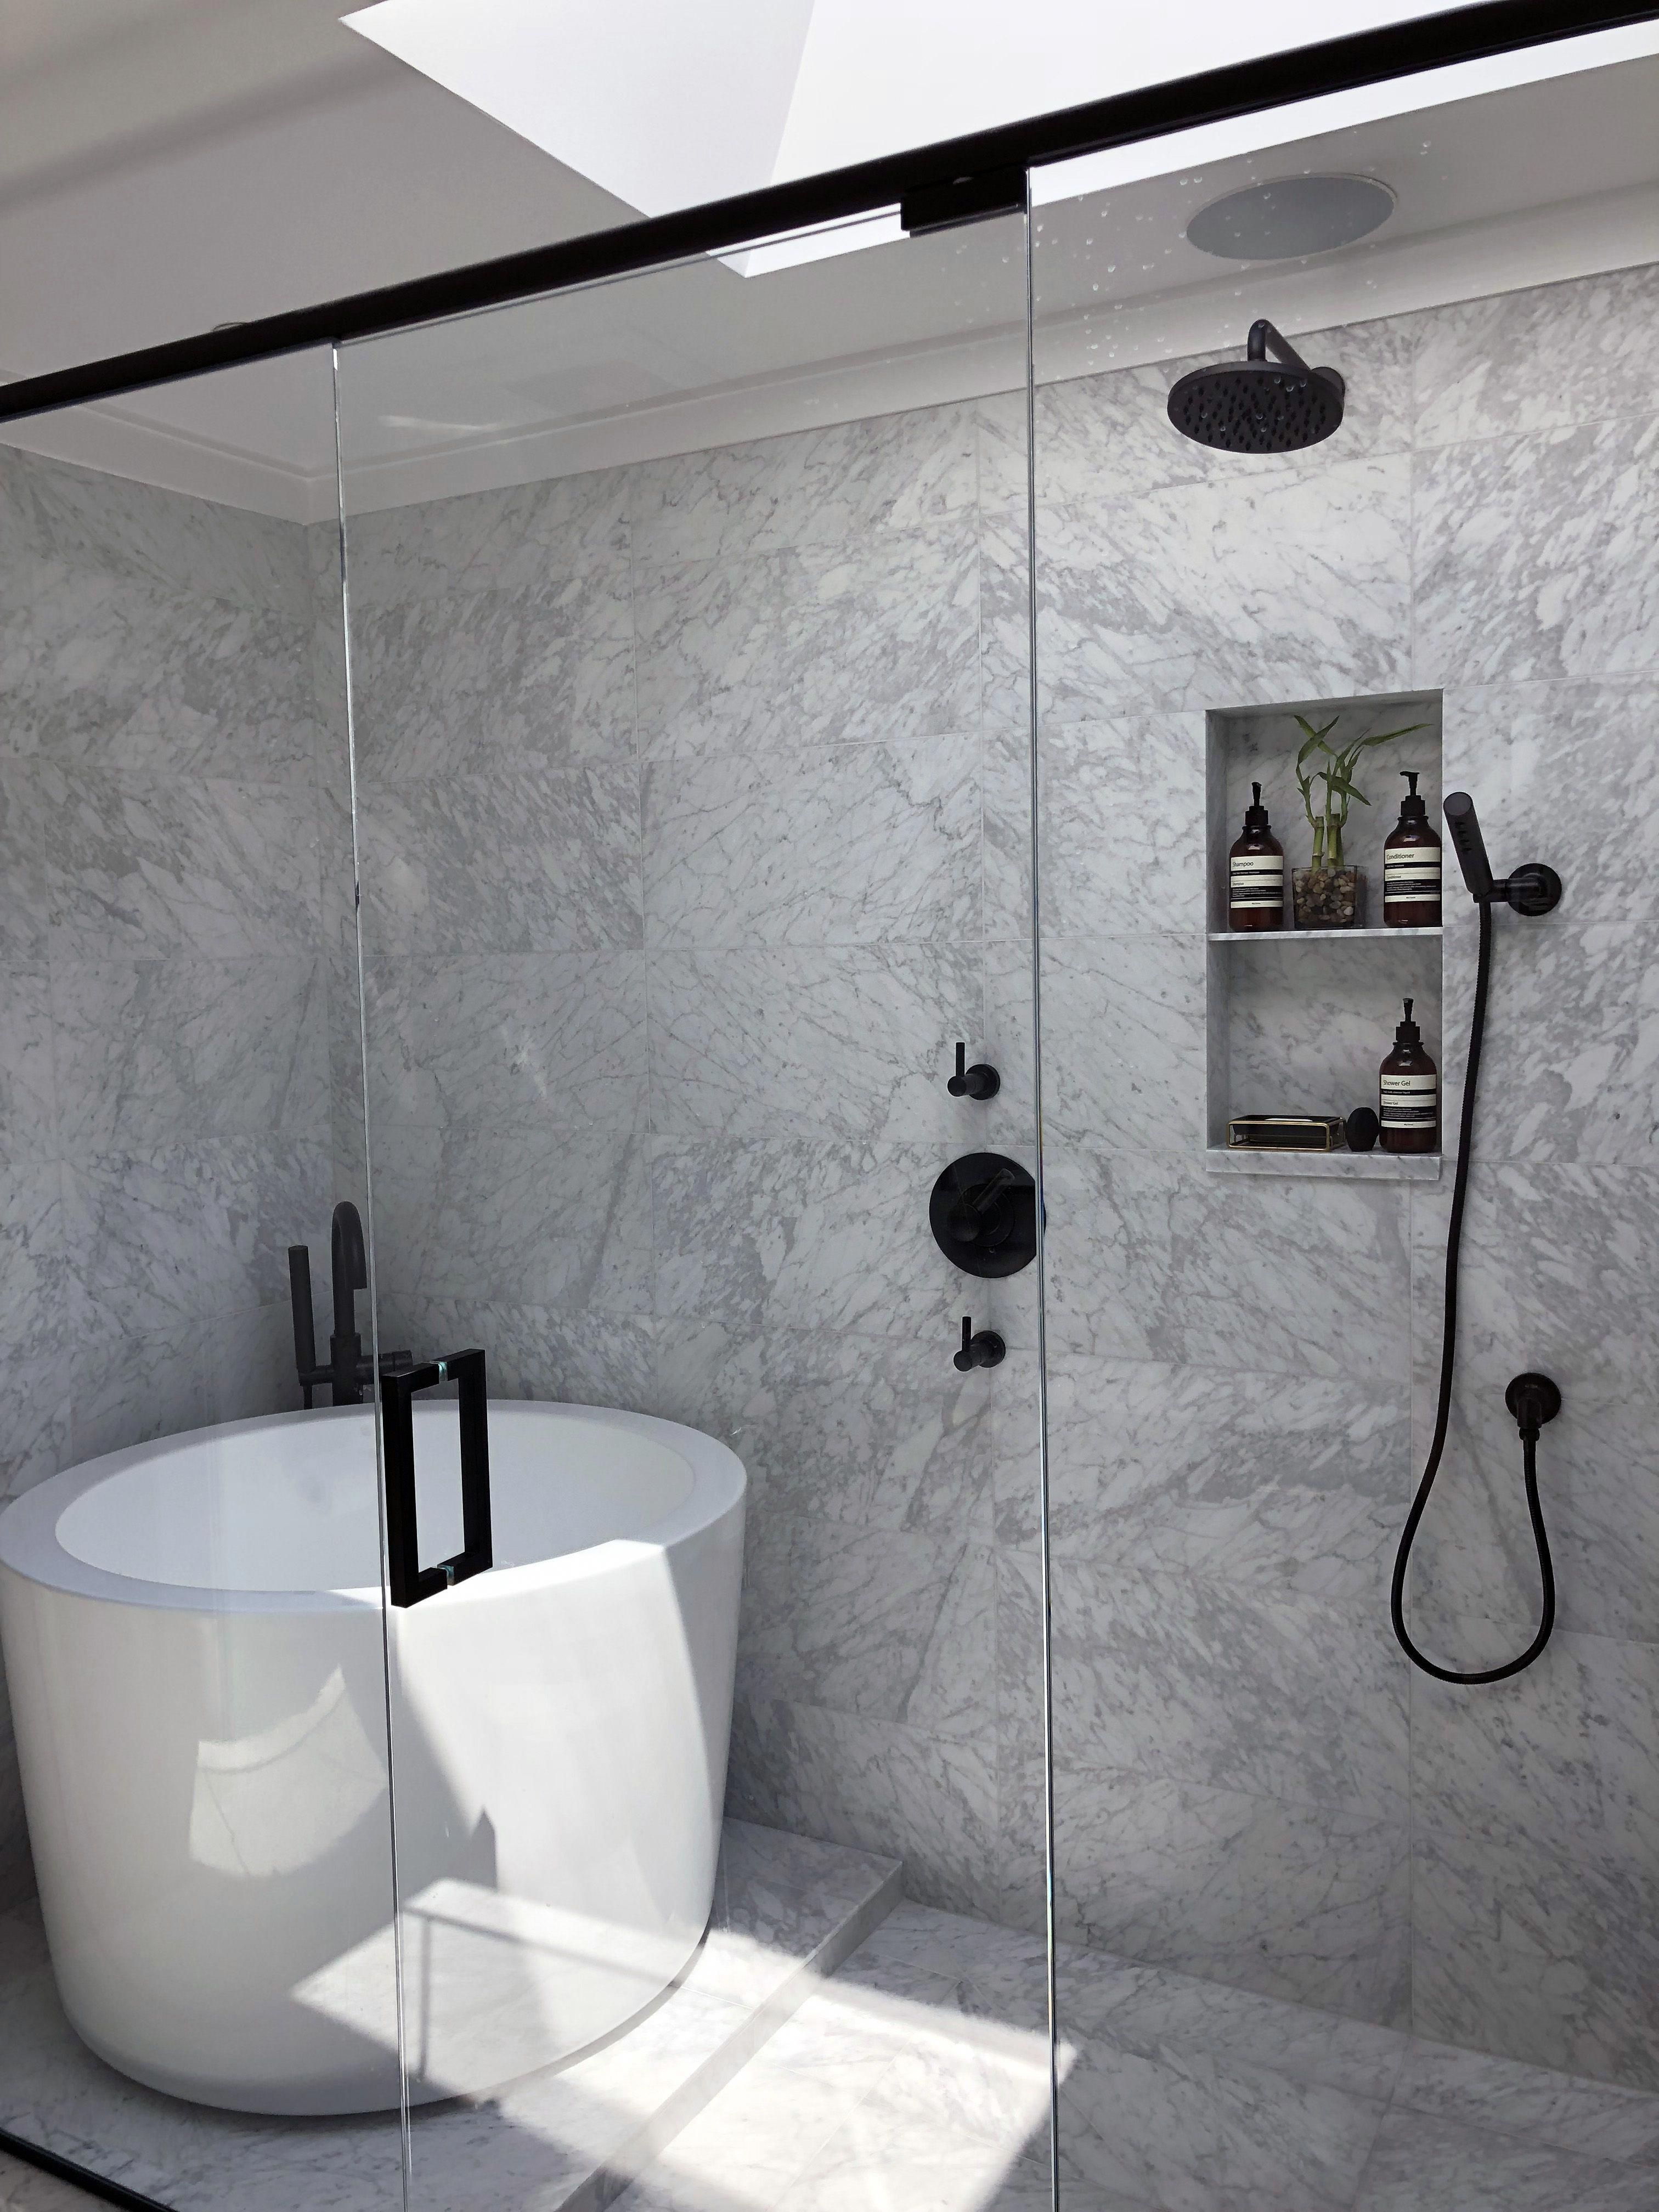 37 Gorgeous Bathroom Tub Shower Combo Design Ideas Soaking Tub Shower Combo Bathroom Tub Shower Combo Japanese Bathroom